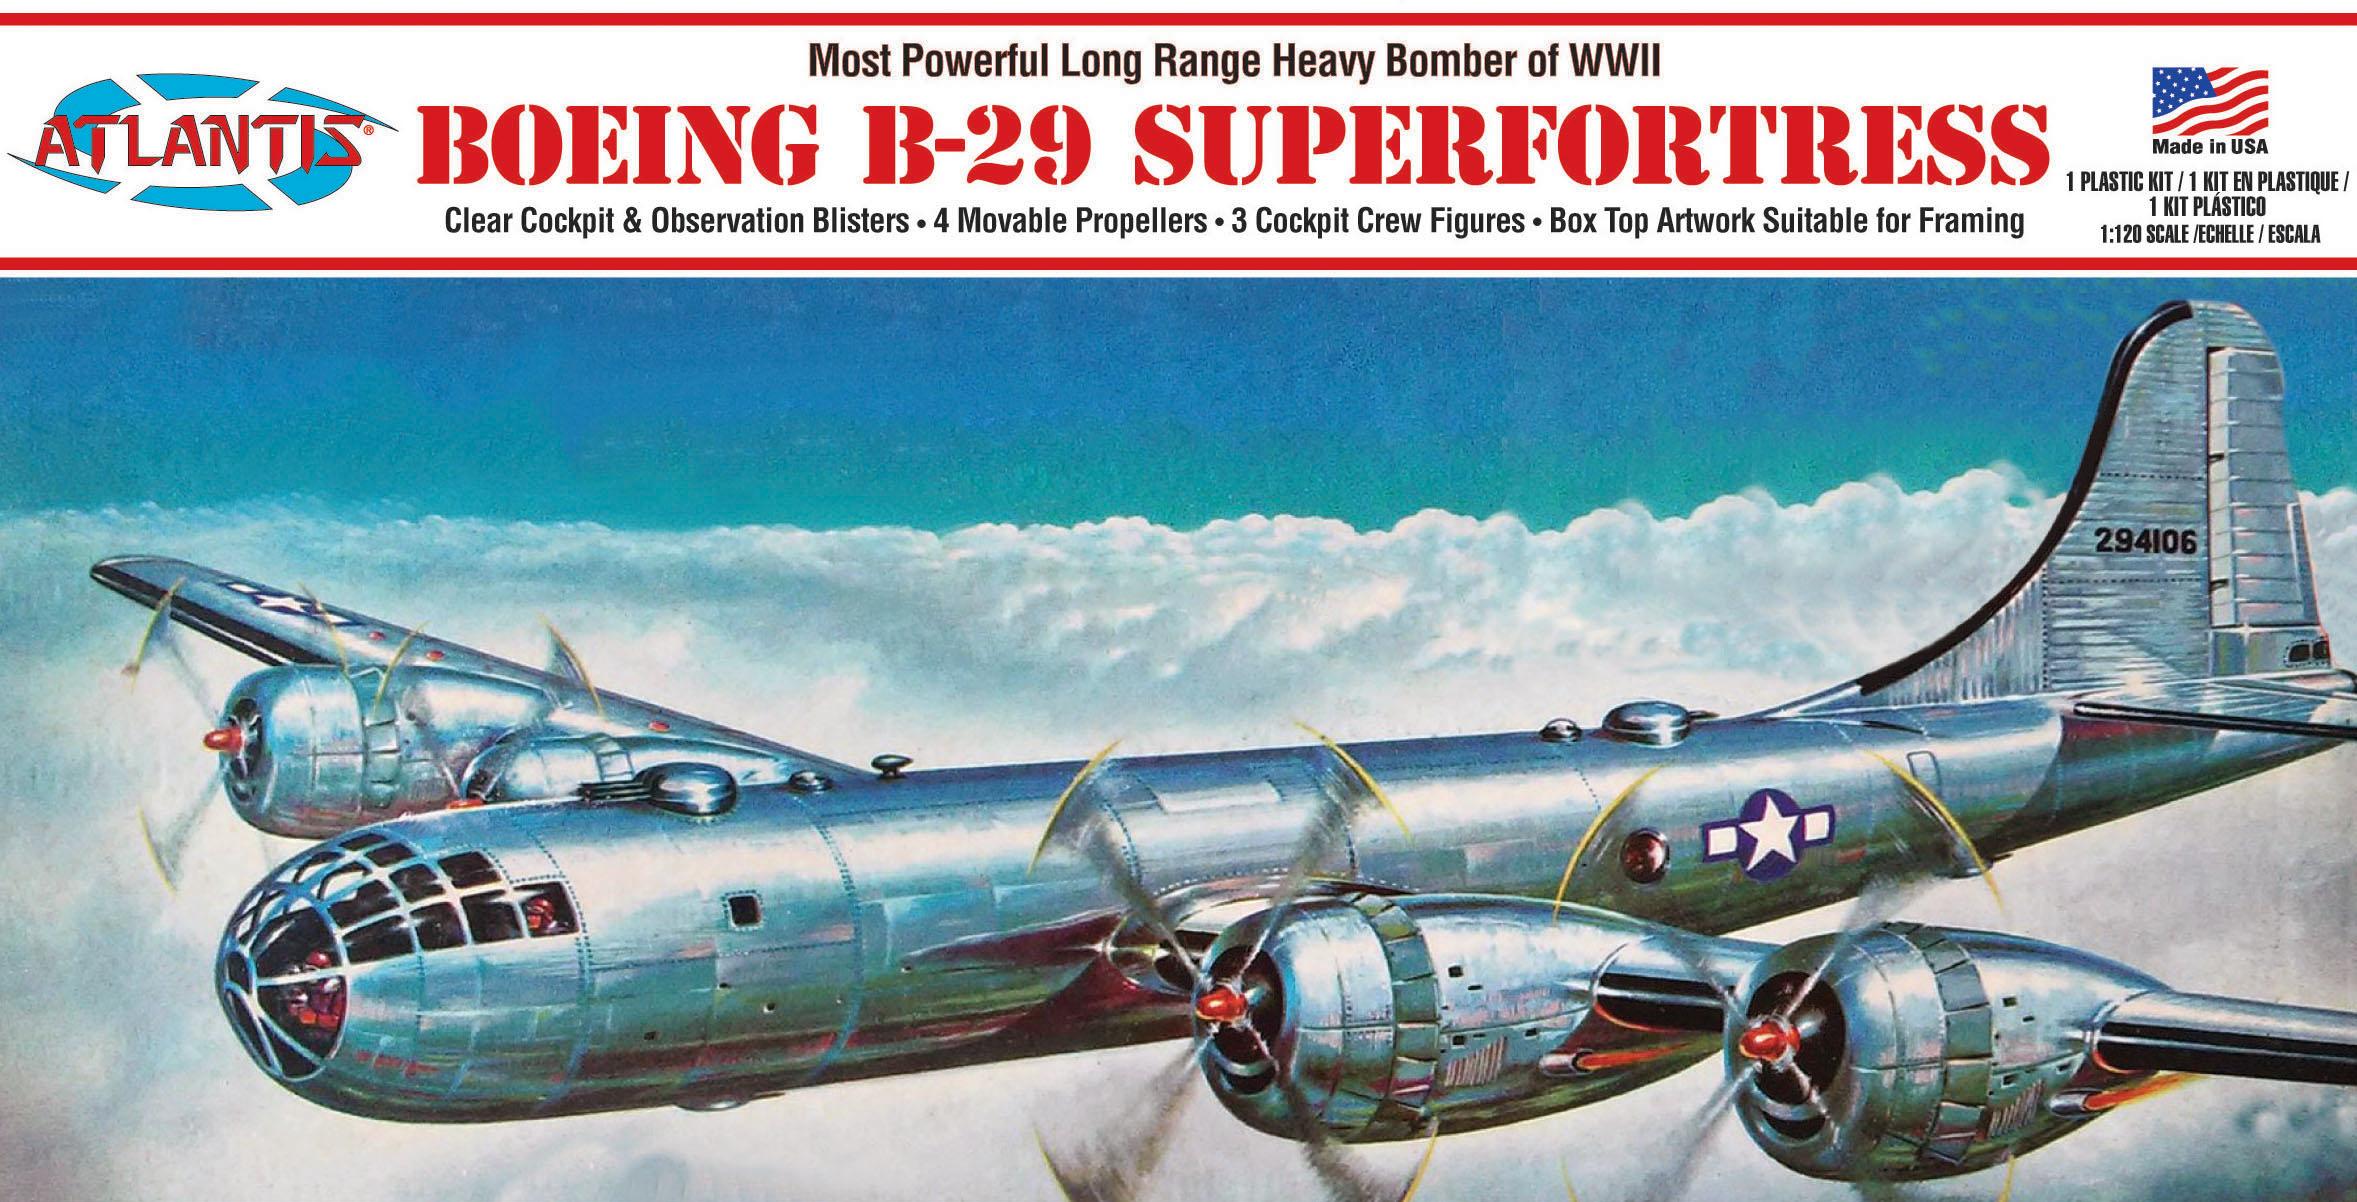 Atlantis 1/120 B-29 Superfortress Bomber